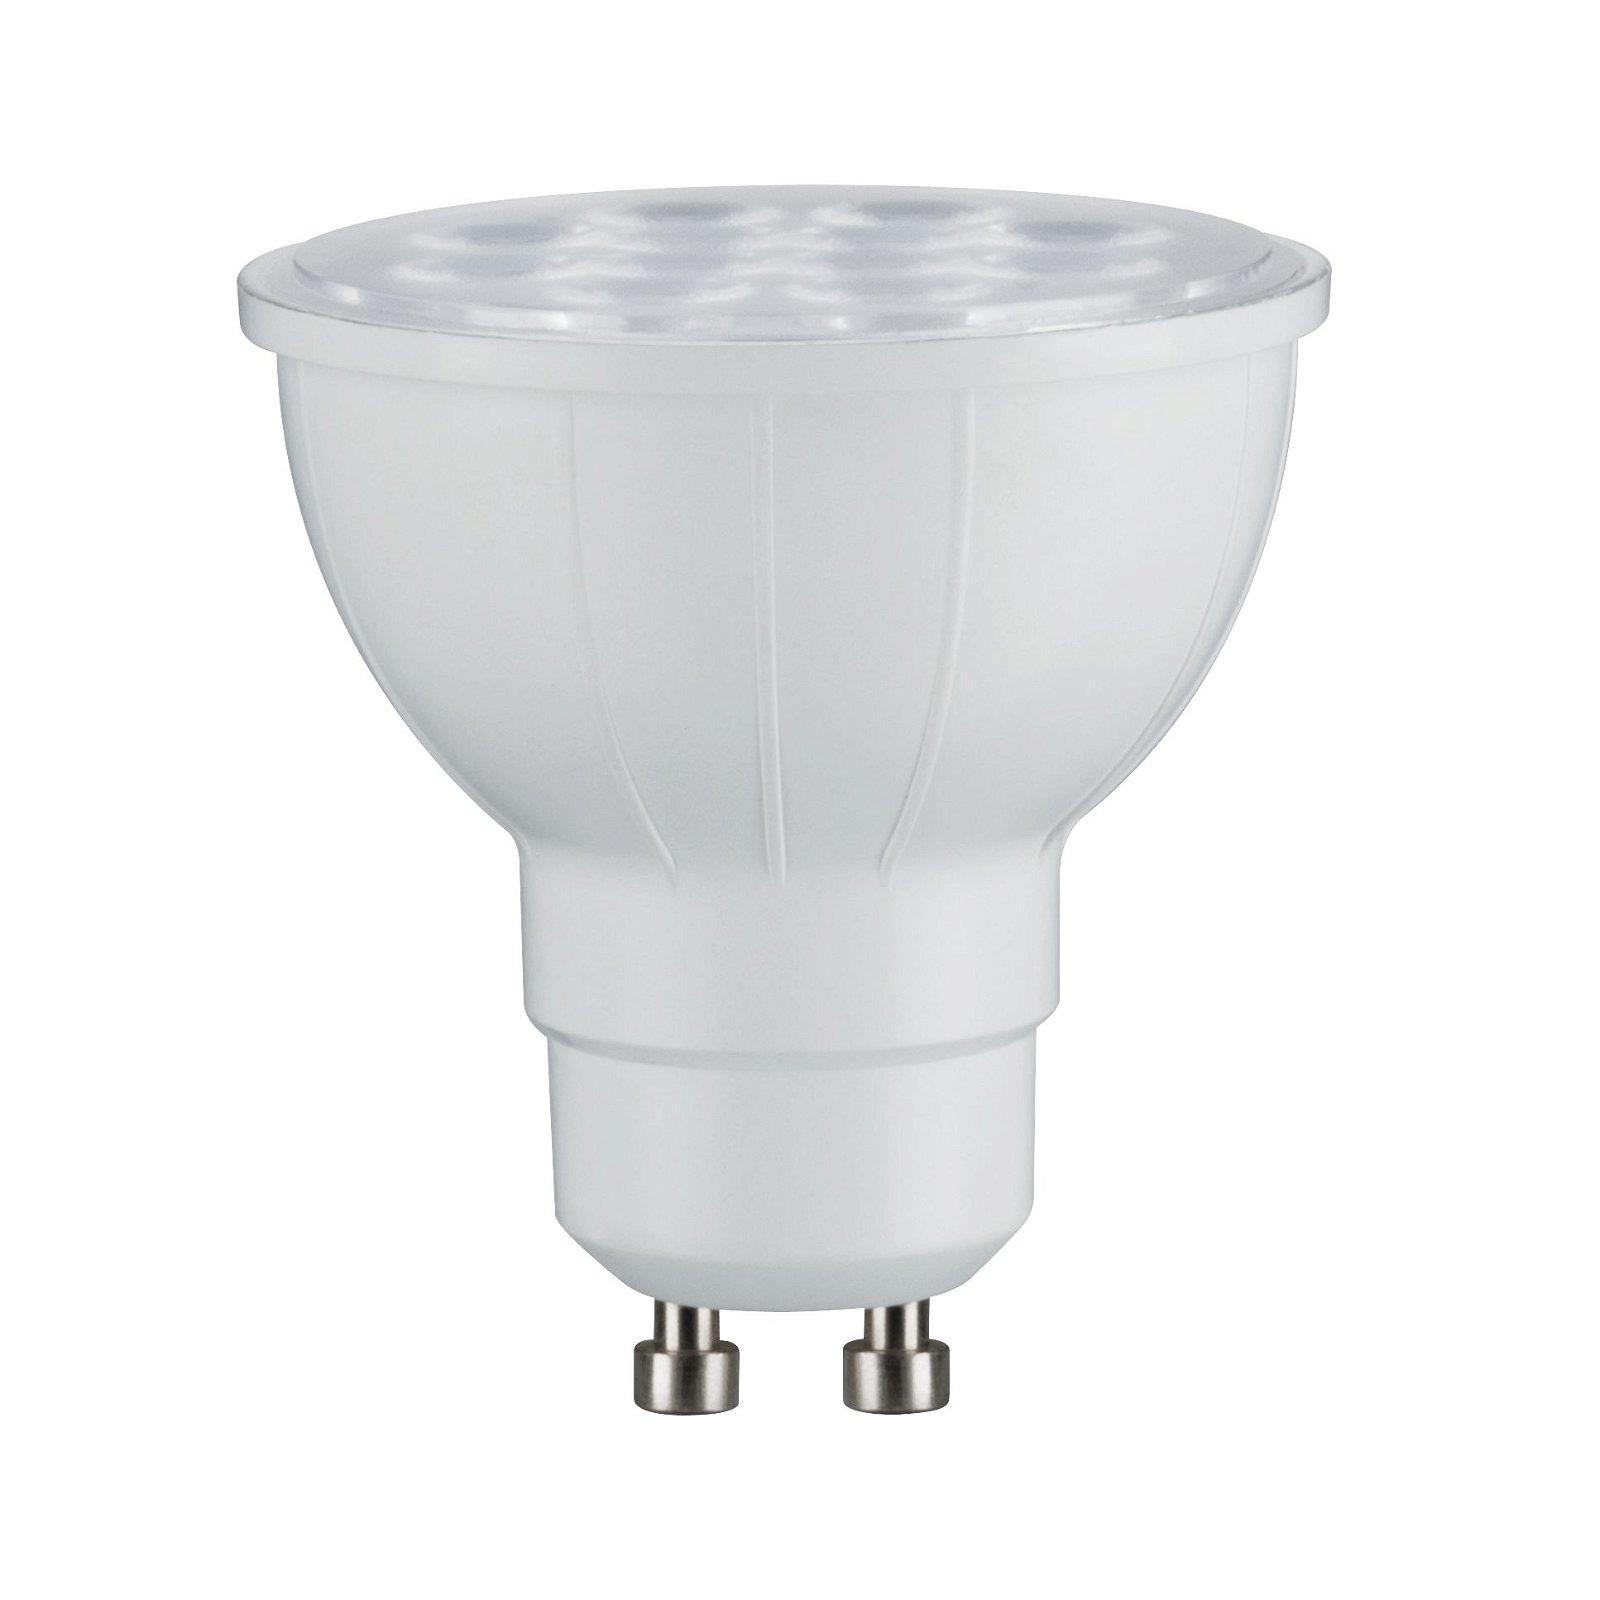 Smart Home Zigbee LED-reflector Gatria 4,8 W GU10 warmwit, dimbaar